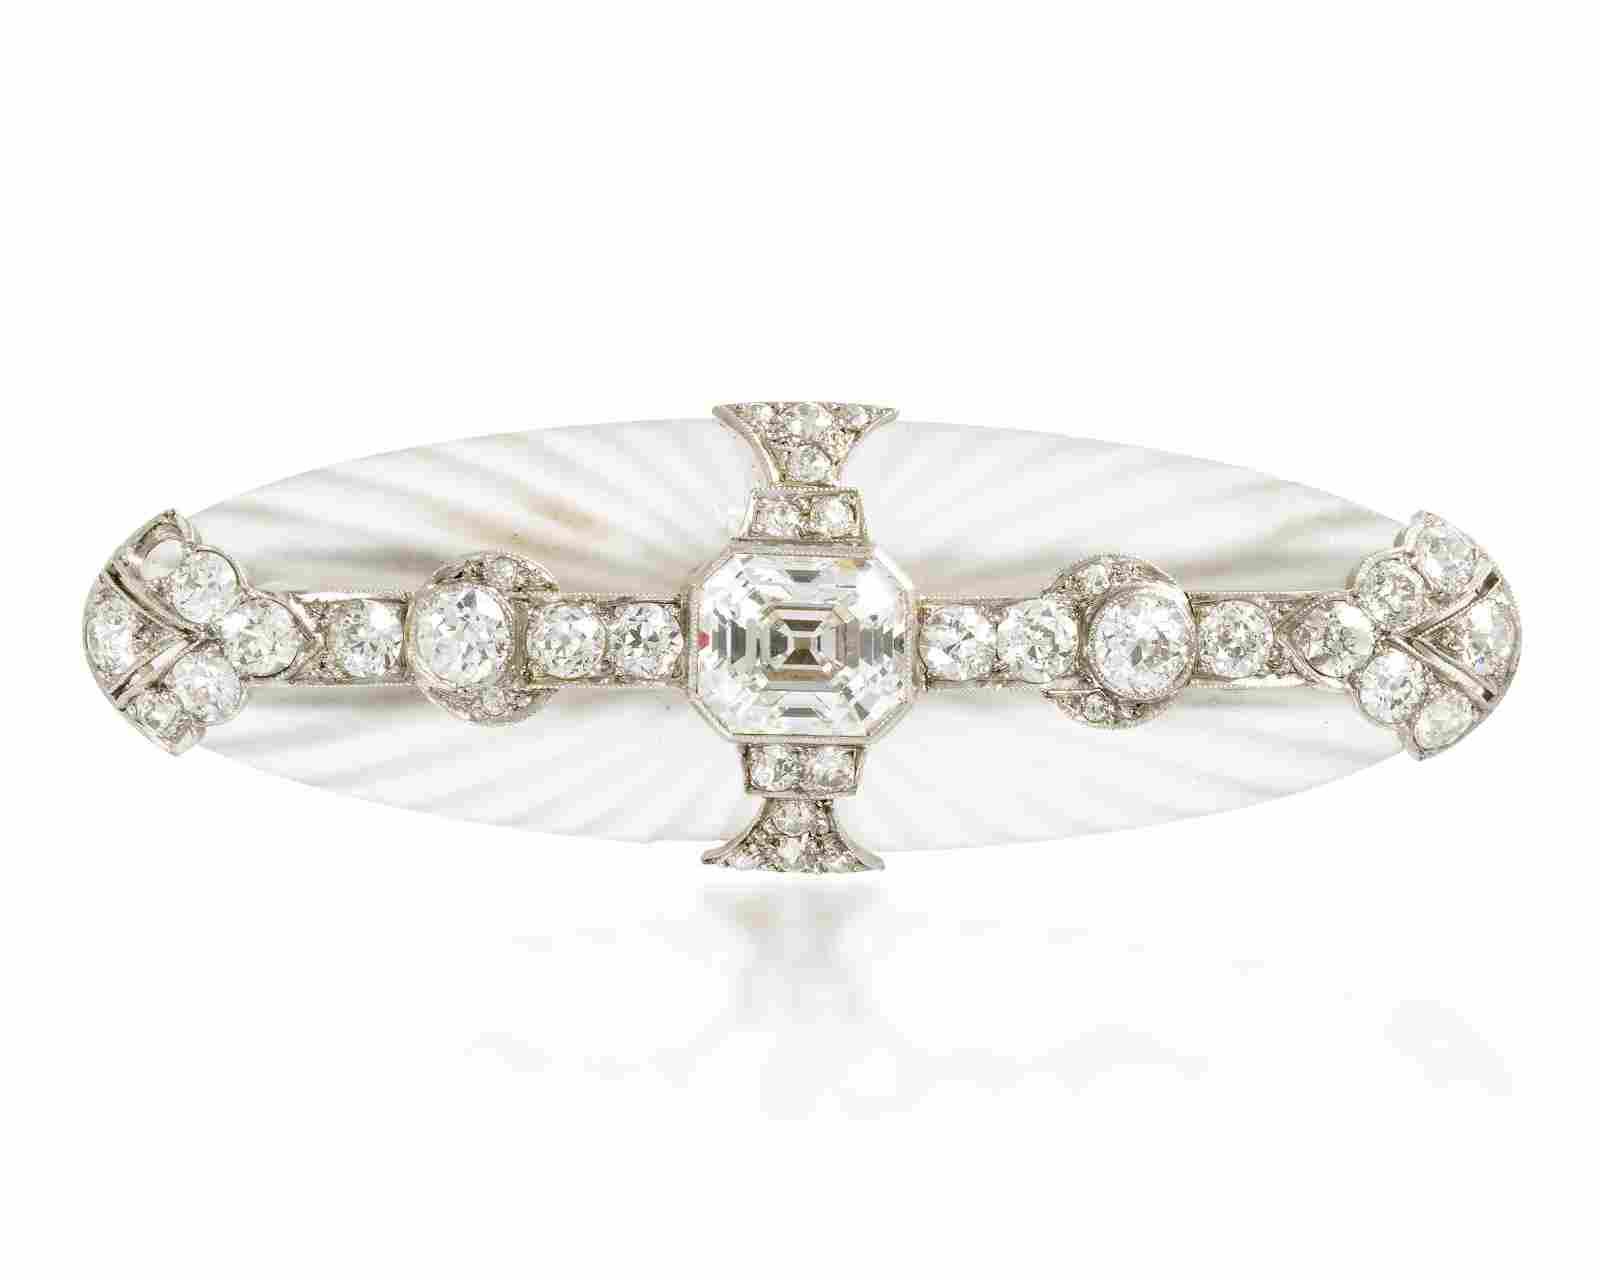 An Art Deco diamond and rock crystal brooch